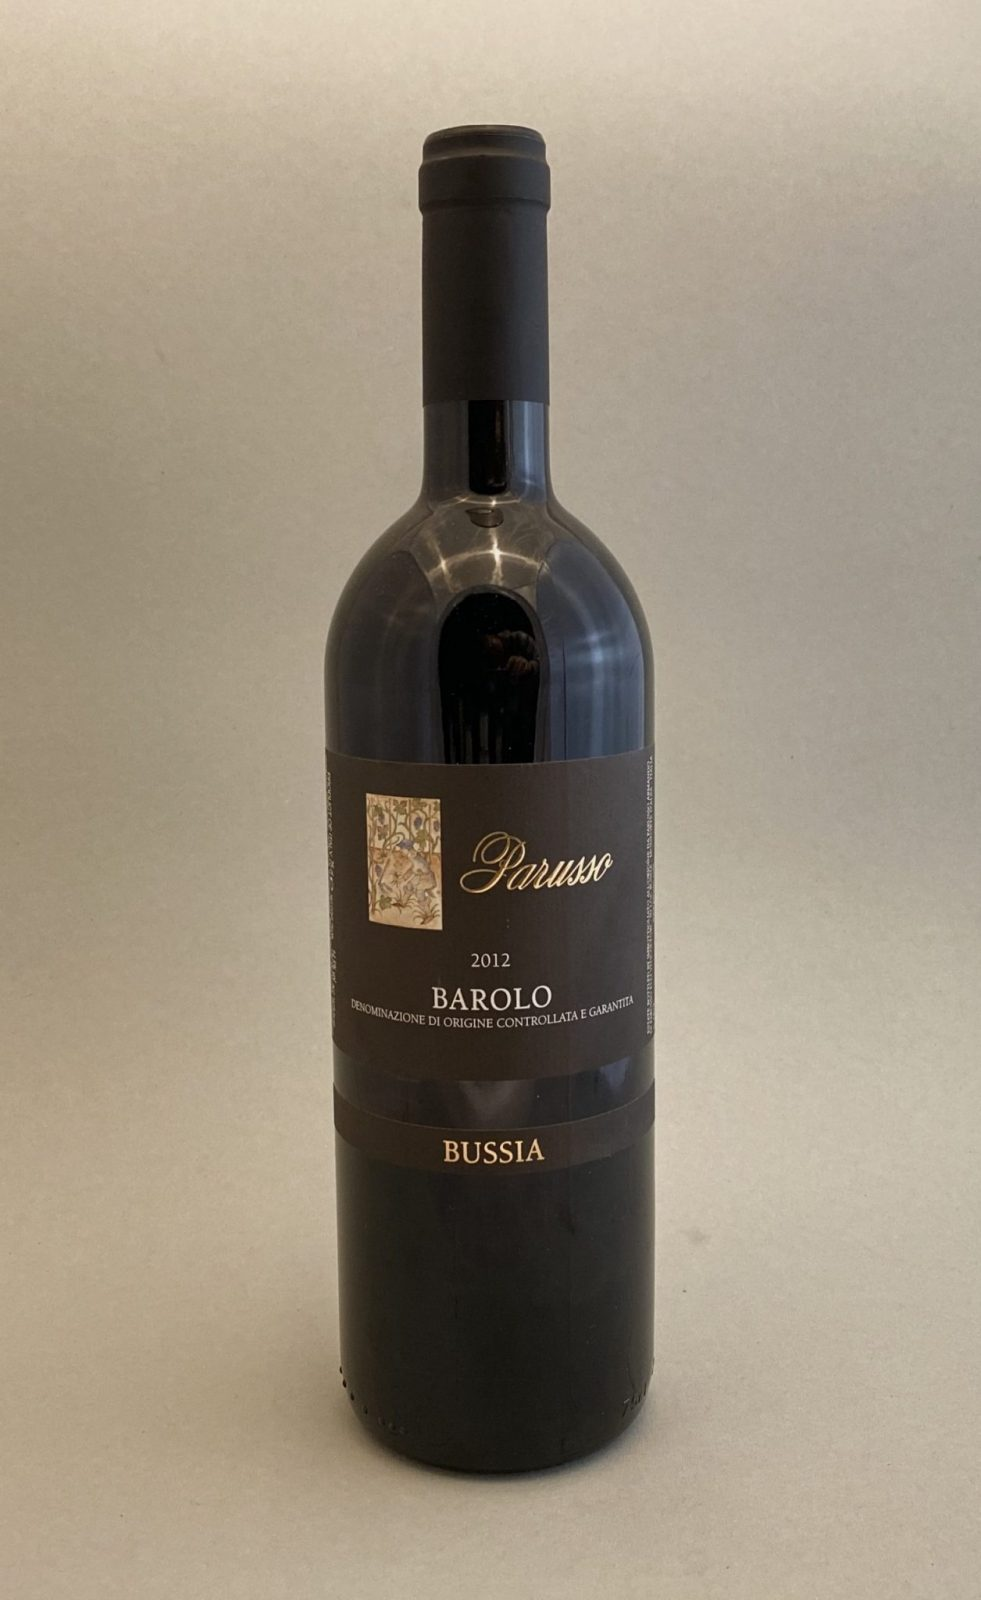 PARUSSO Barolo Bussia 2012, vinoteka Sunny wines slnecnice mesto, Bratislava petrzalka, vino červené z Talianska